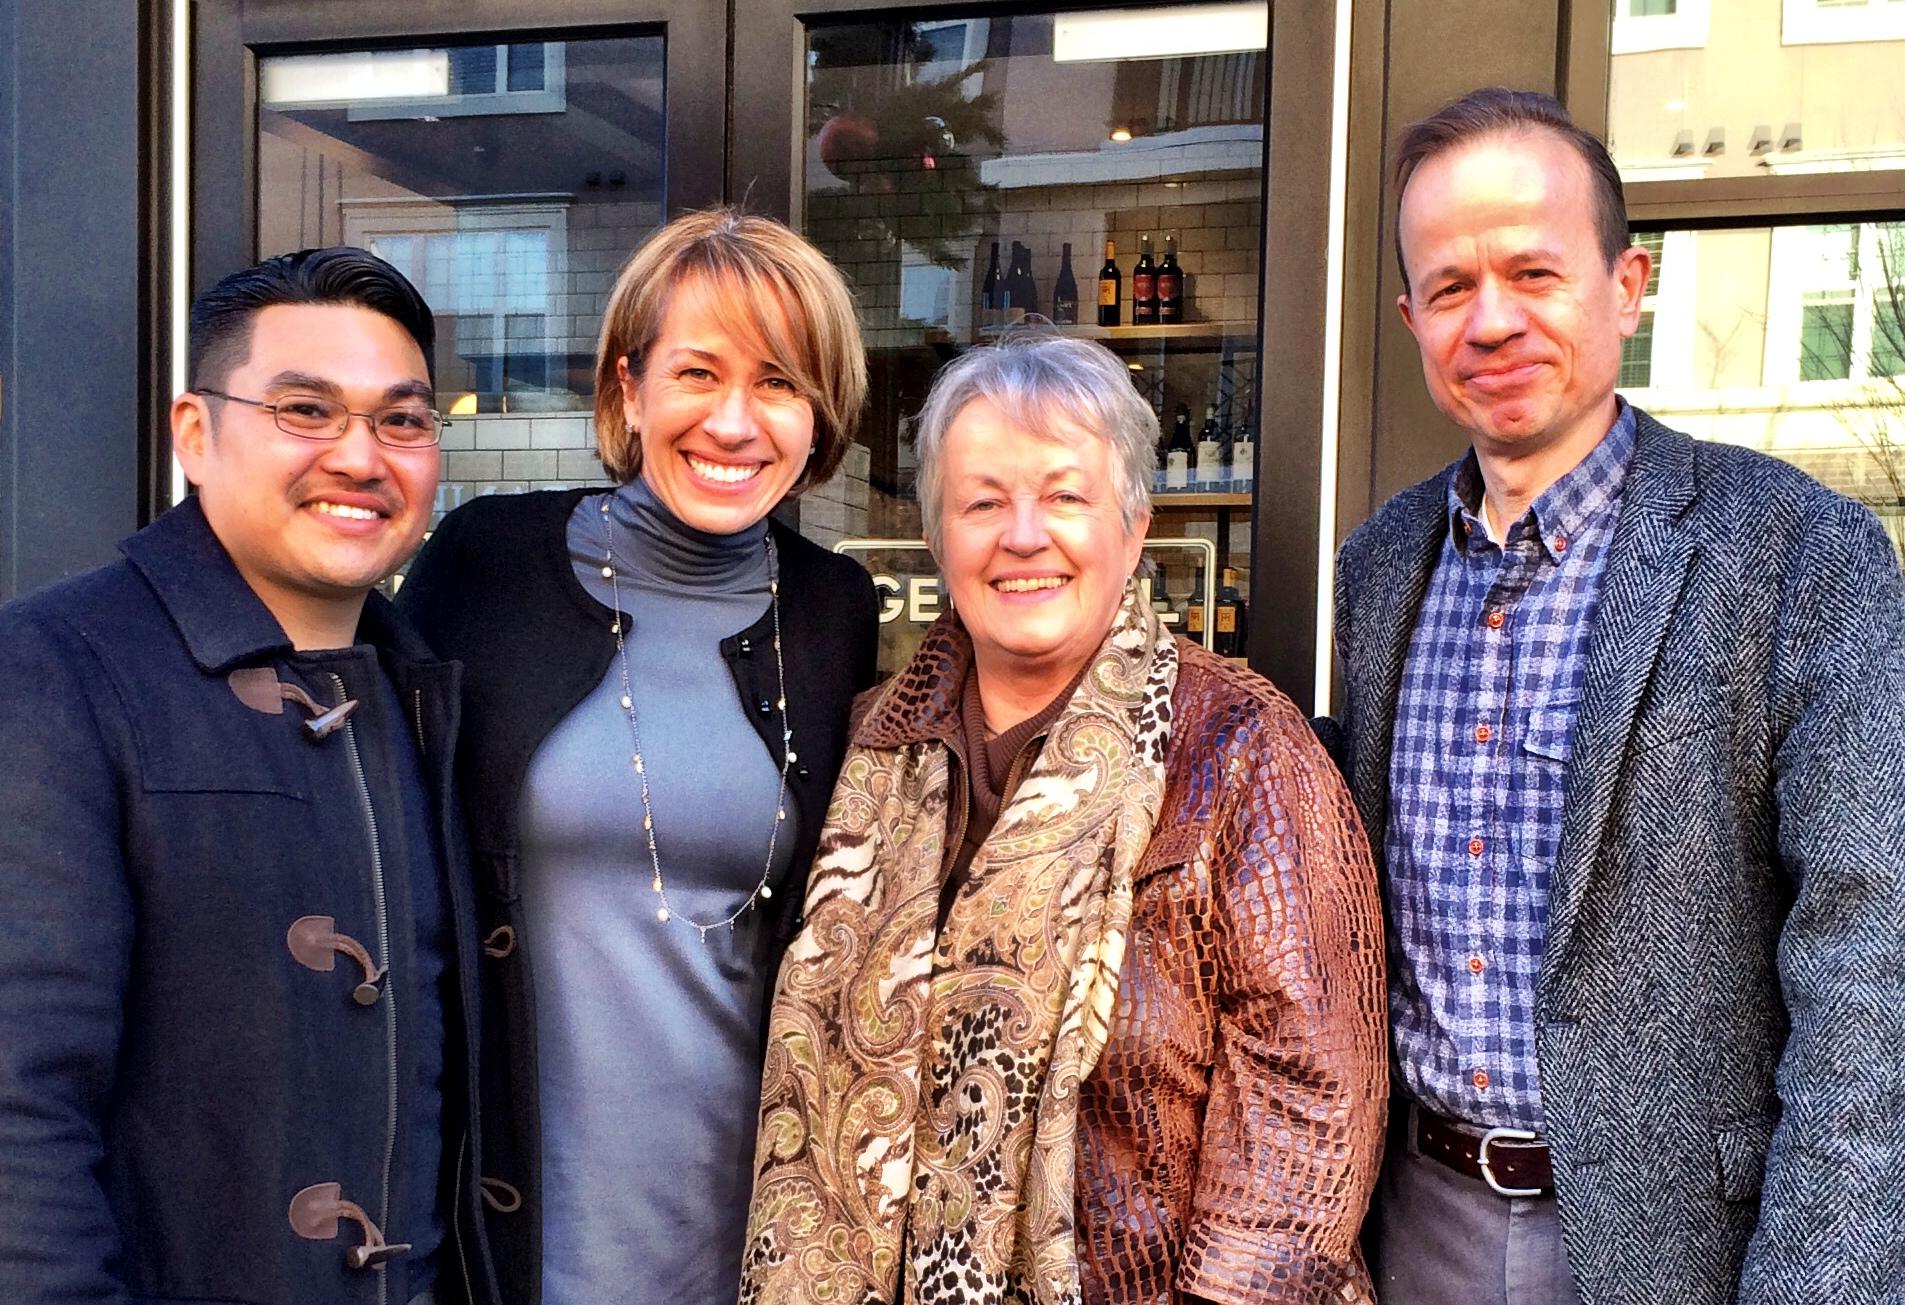 Quang, Nan Orrock, Sarah, and Bill